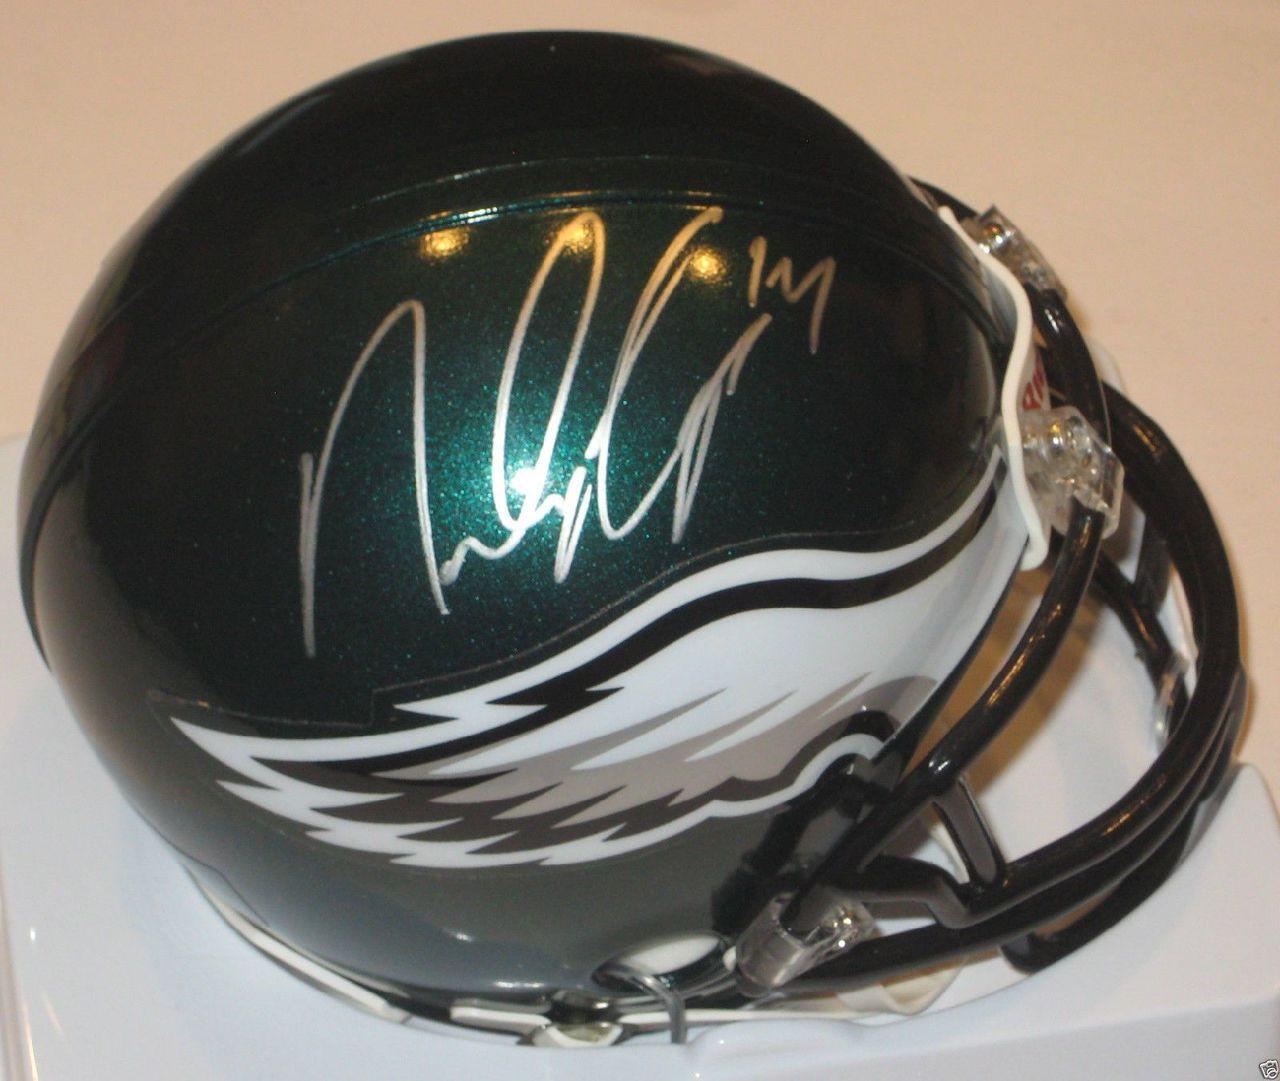 release date 264a4 83429 Riley Cooper Philadelphia Eagles Autographed Mini Football Helmet